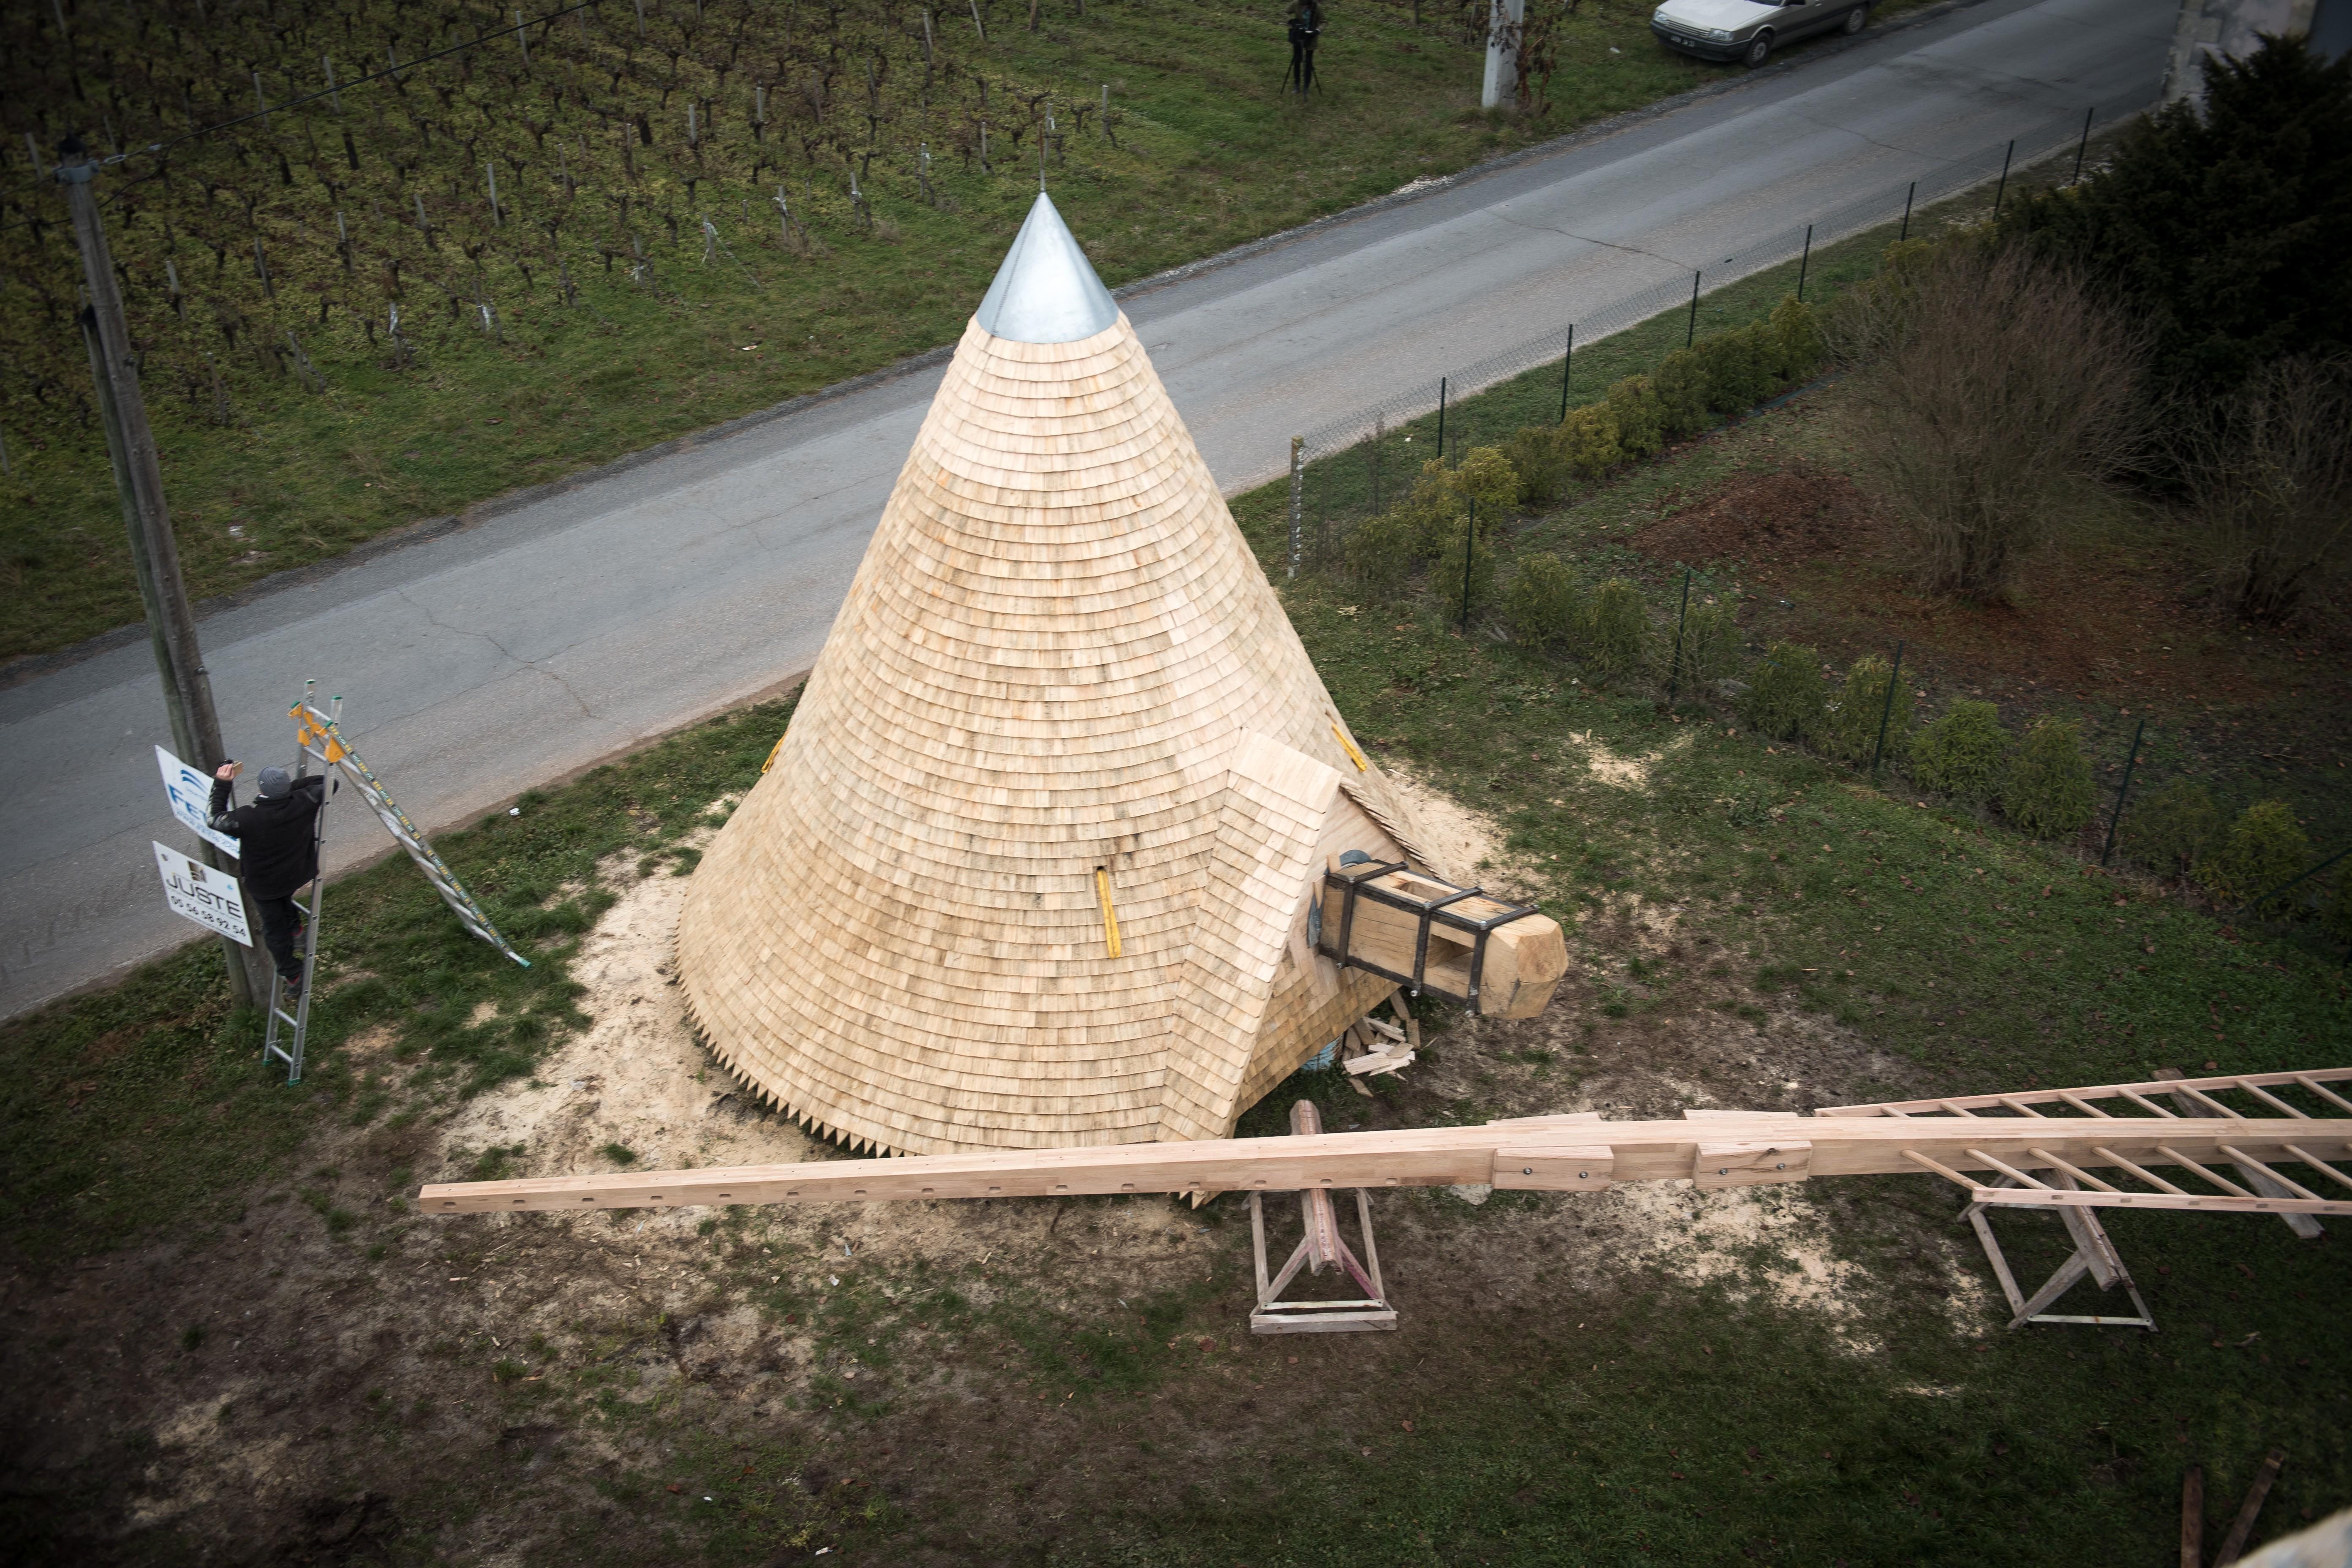 moulin-de-malescasse-restauration-toiture-12